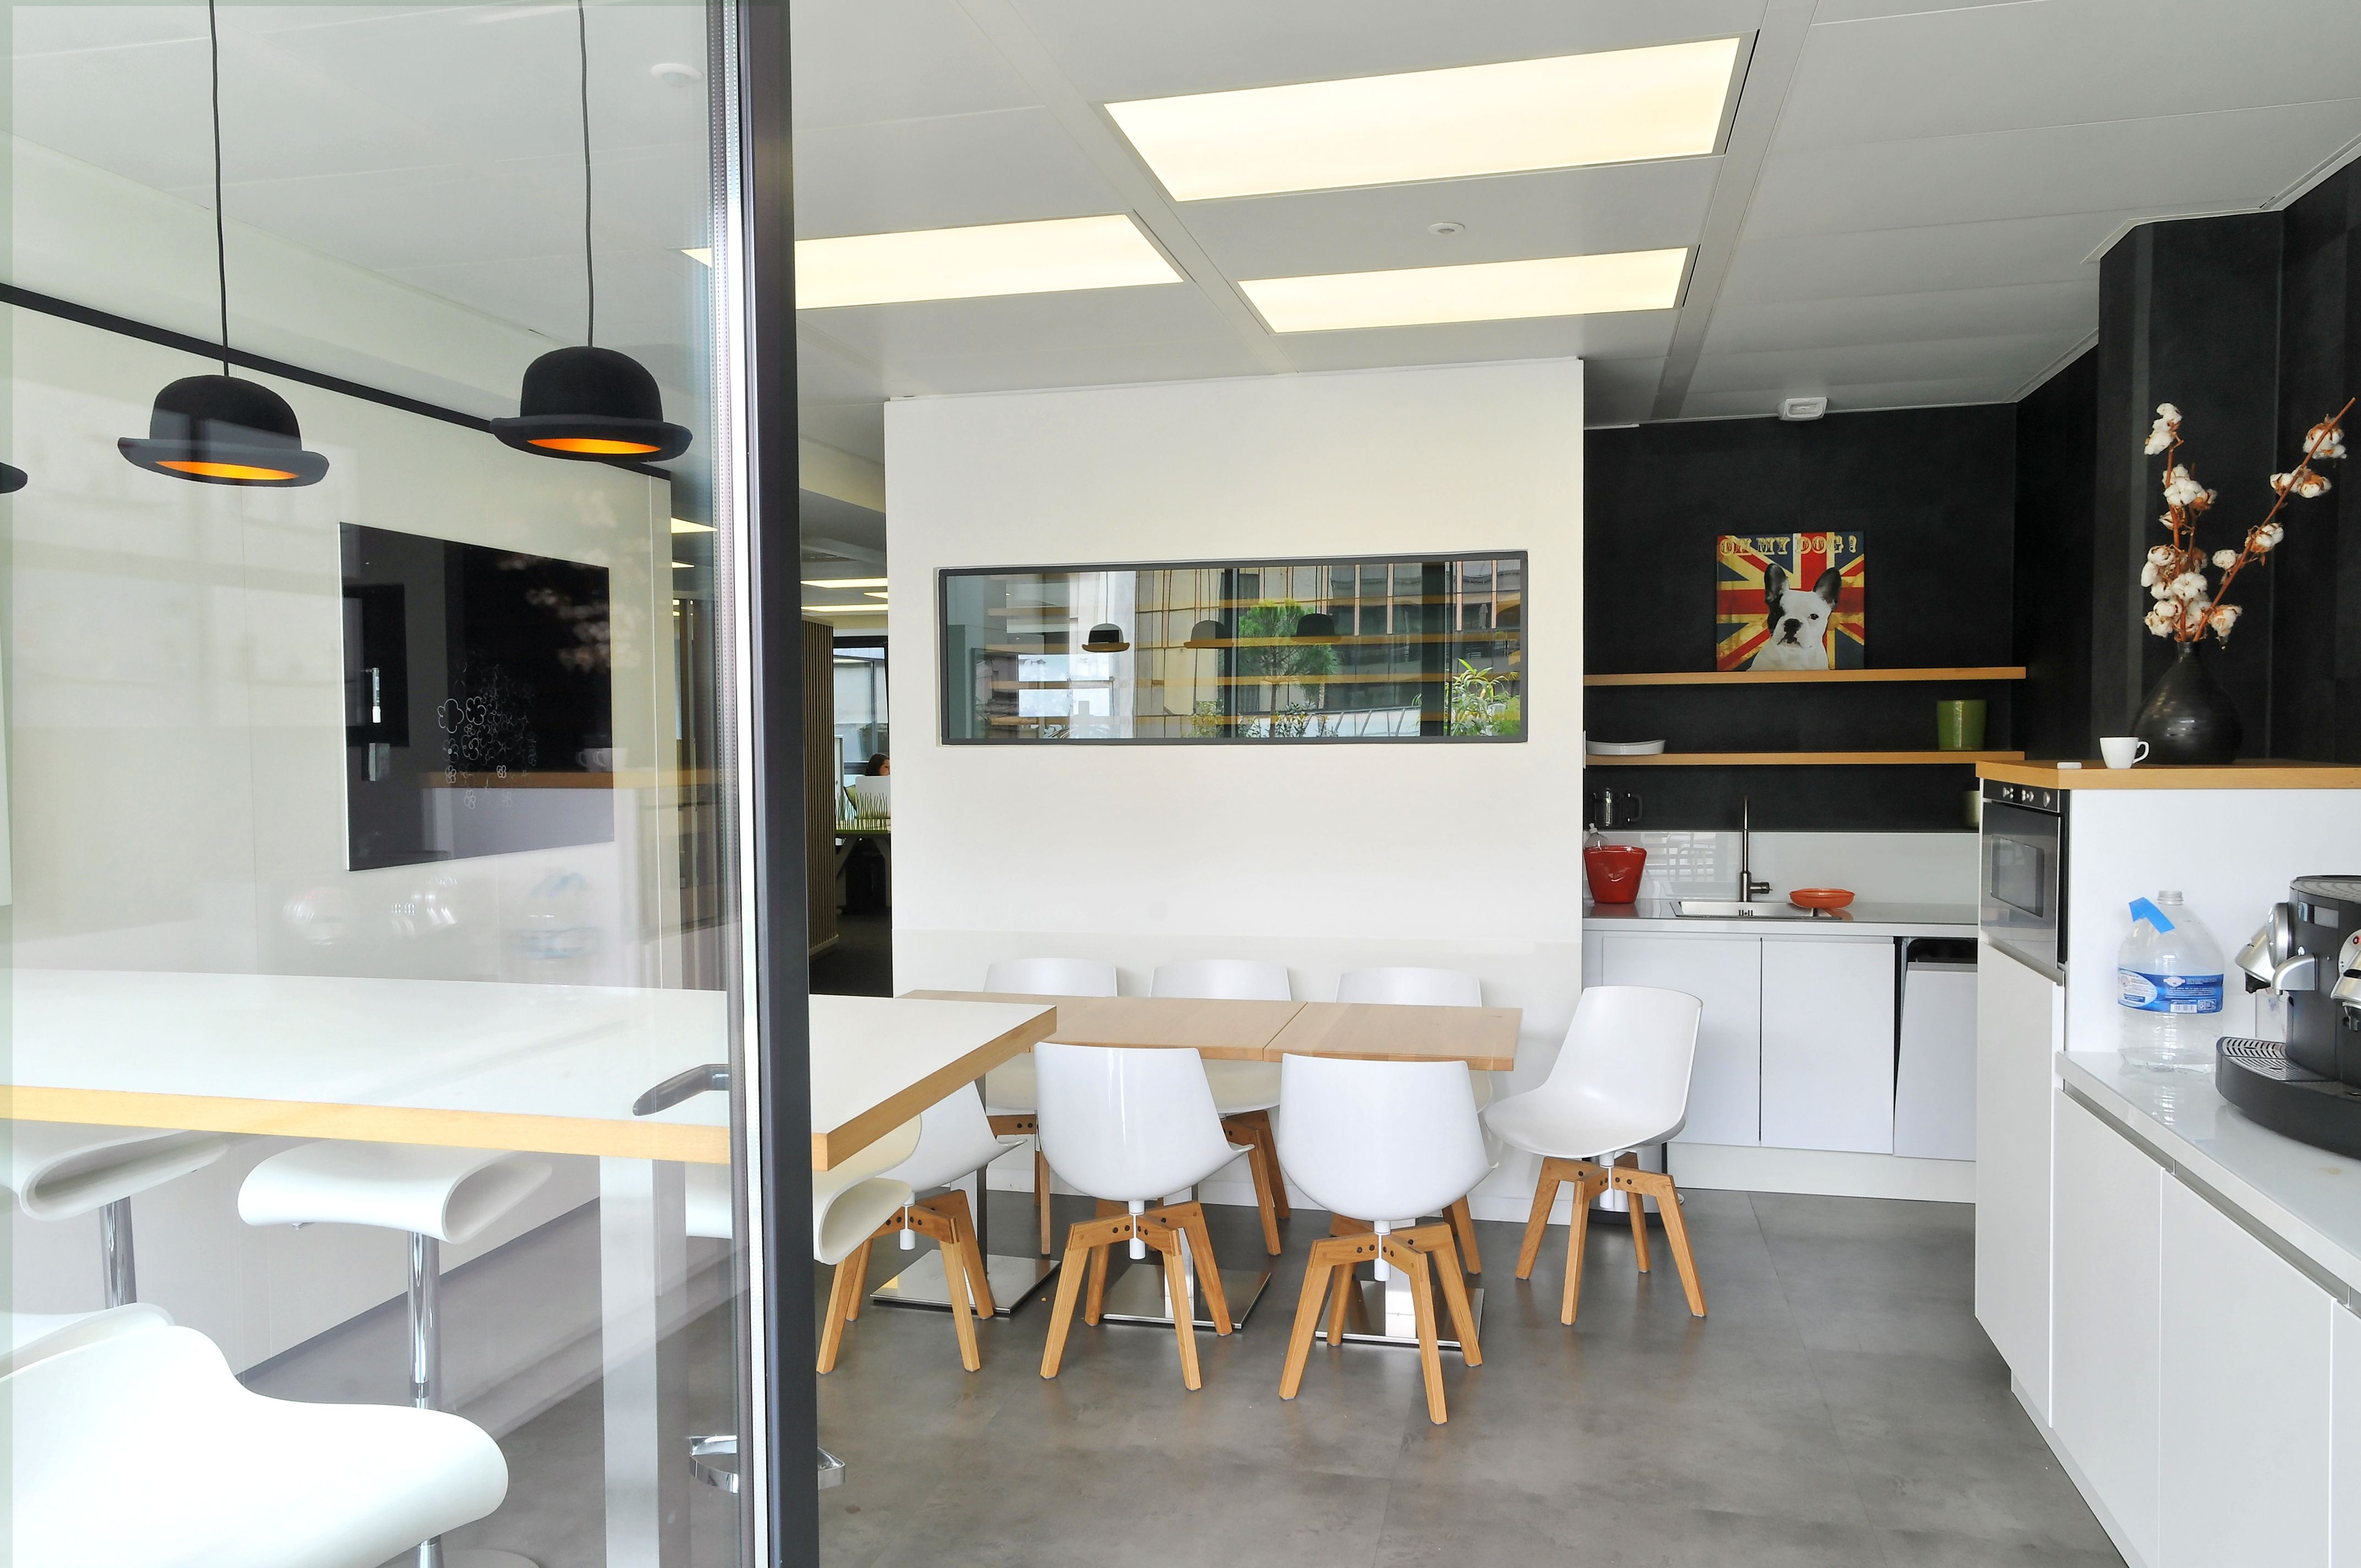 Etienne de souza designer and manufacturer of luxury cabinet - Cafeteria Design By Cl Ram Style Design Bureau Architecture Am Nagement